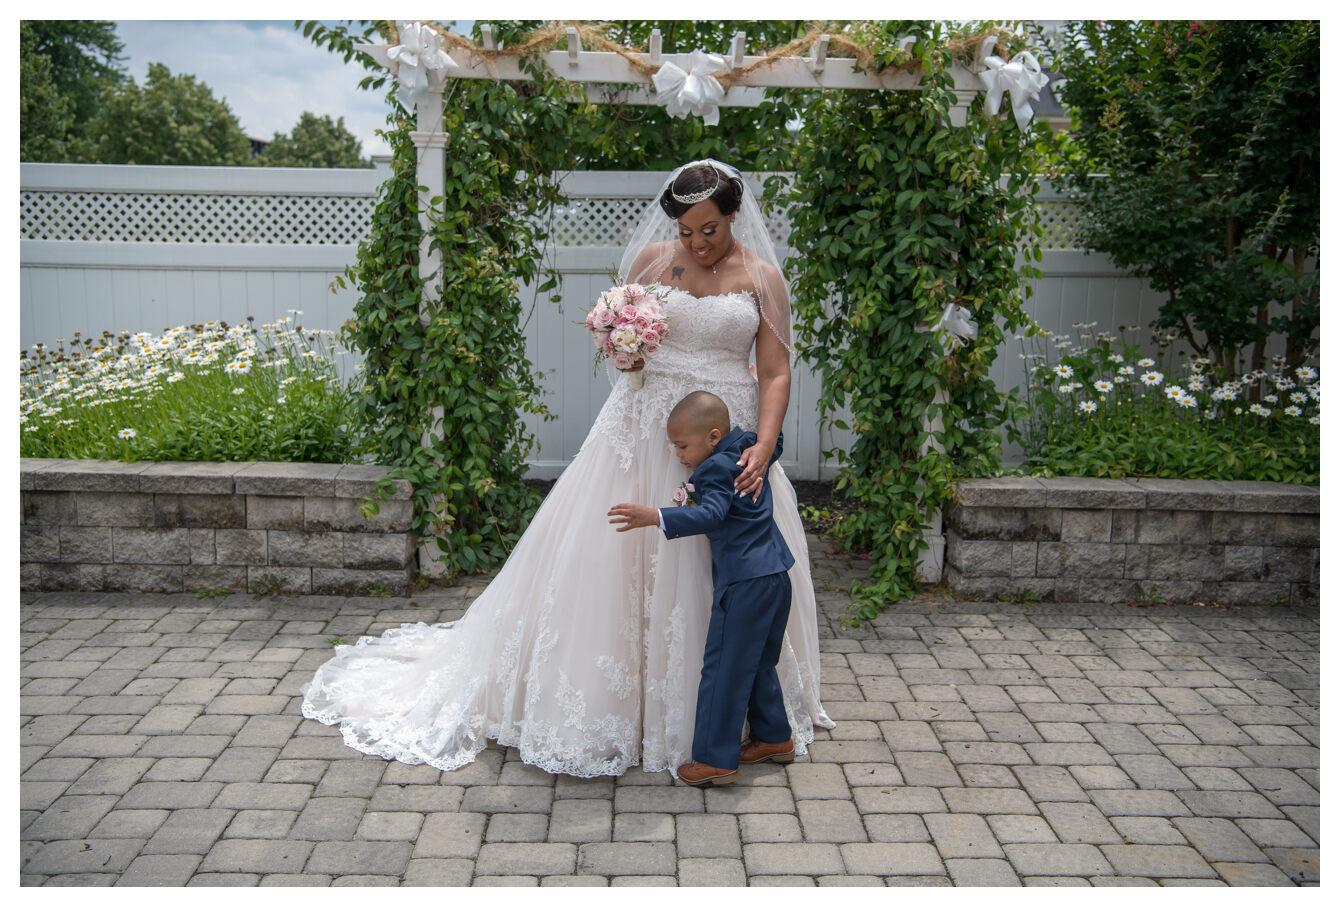 woods_wedding_kevkramerphoto_web-7.jpg